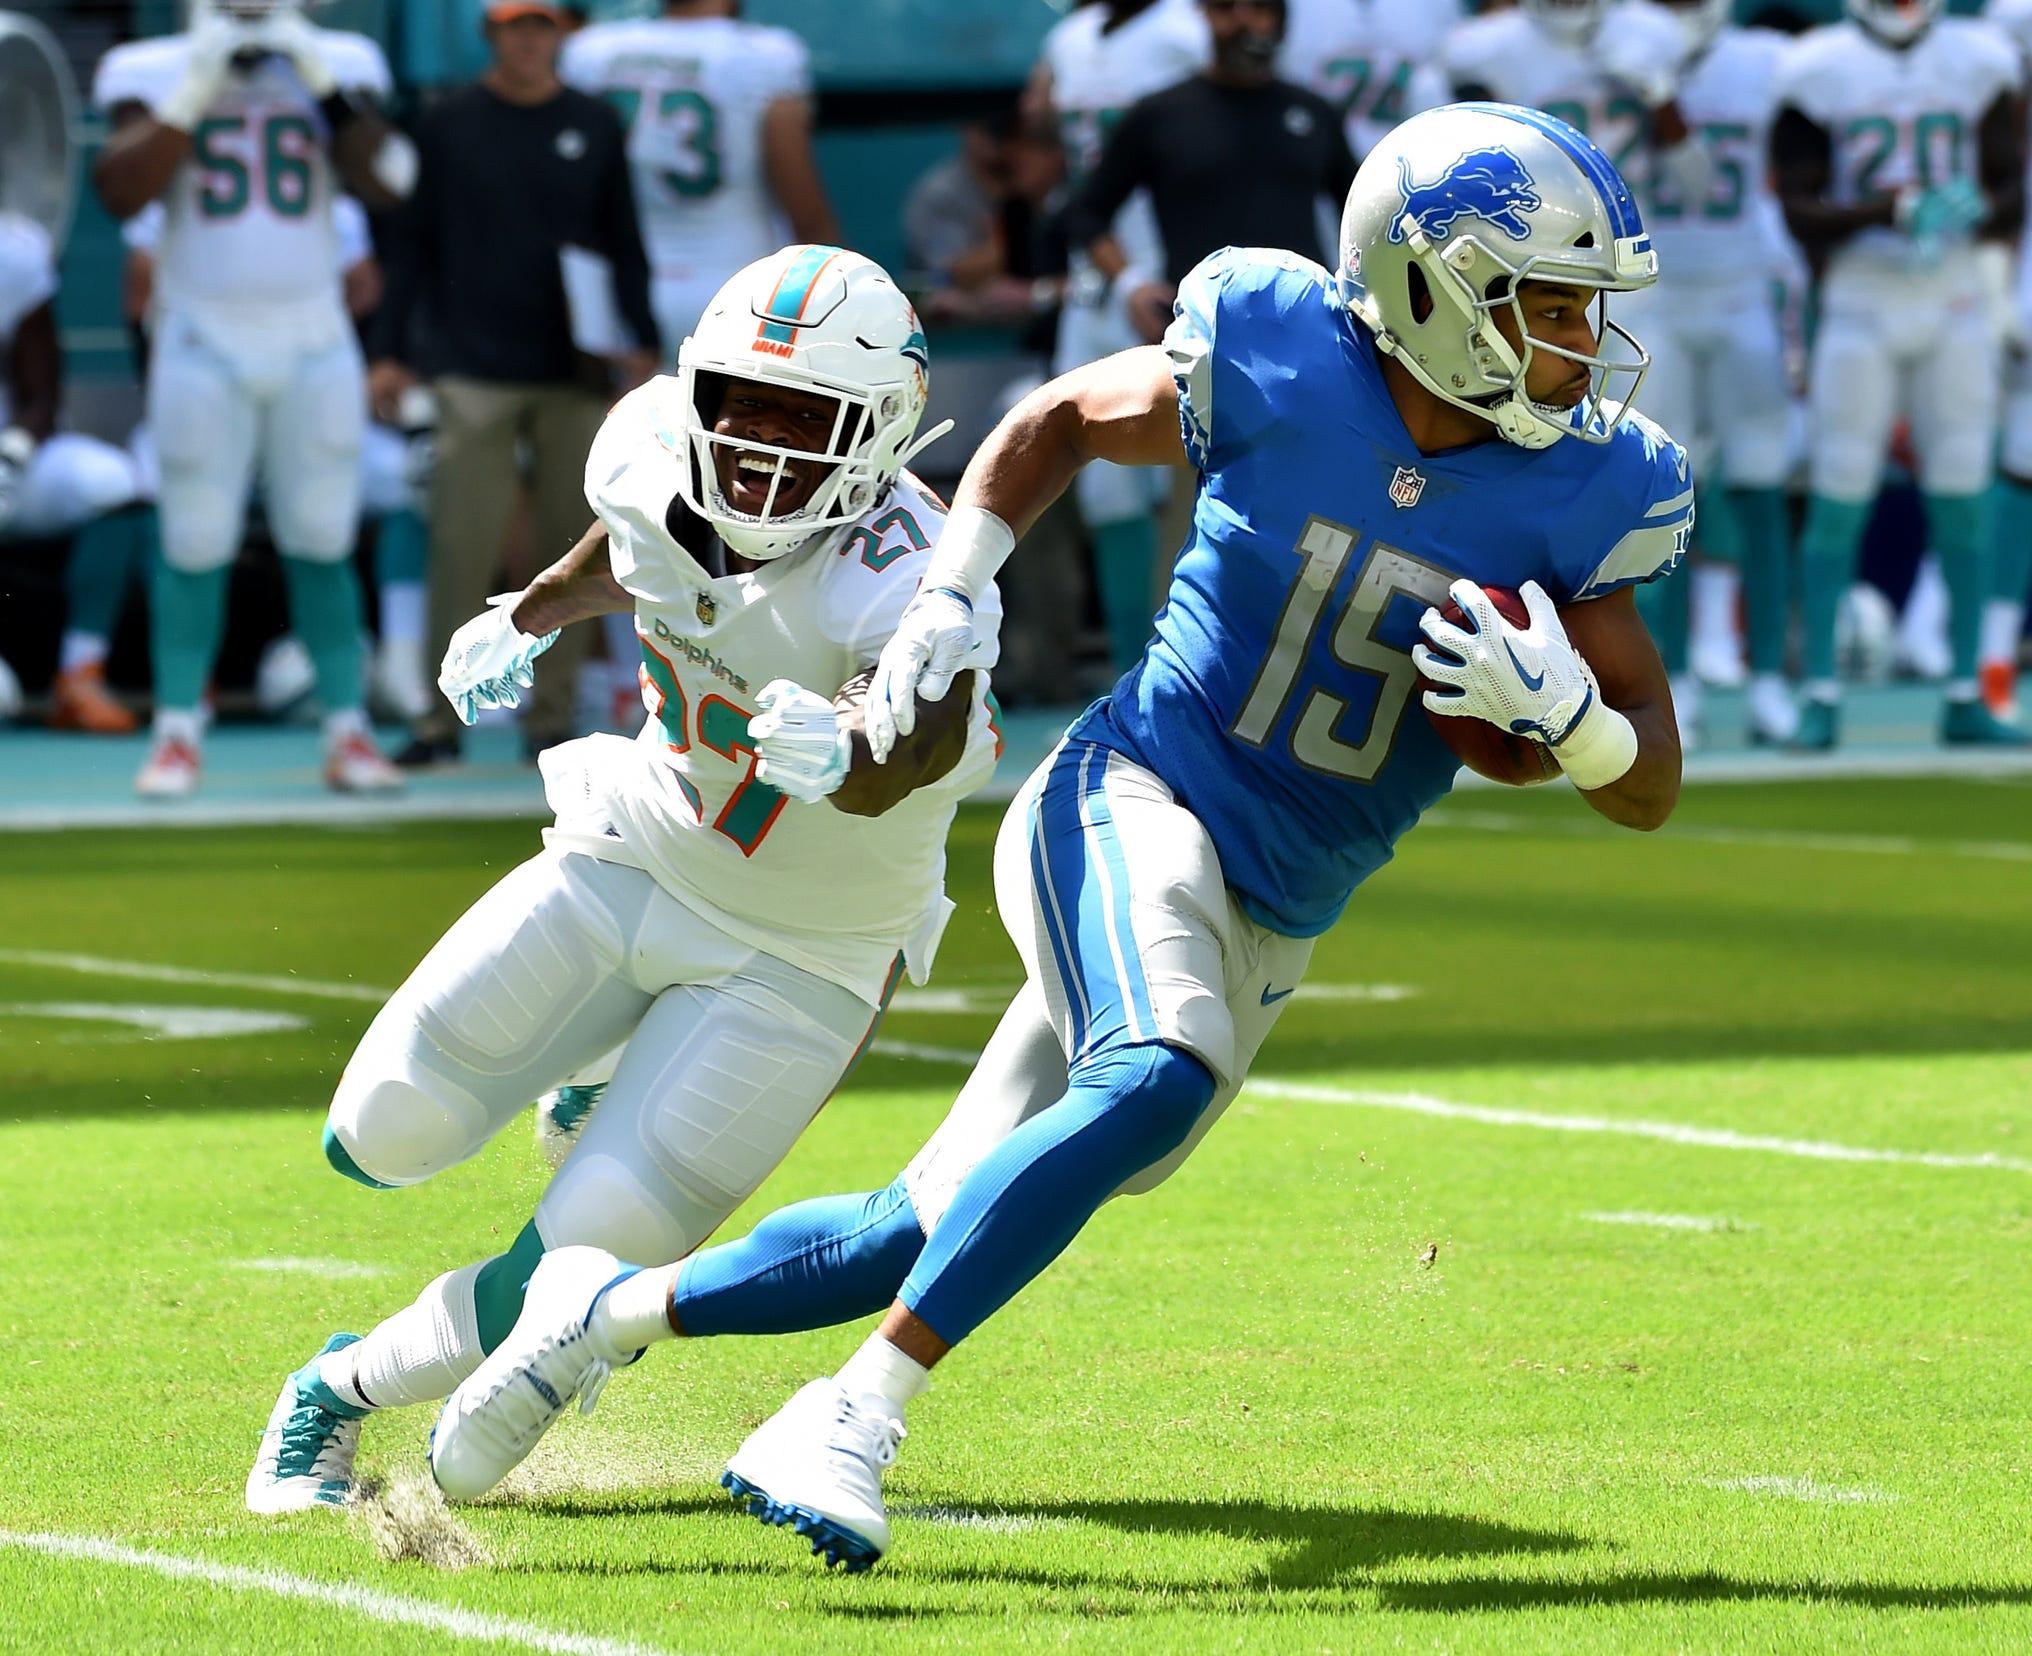 Nfl Detroit Lions At Miami Dolphins